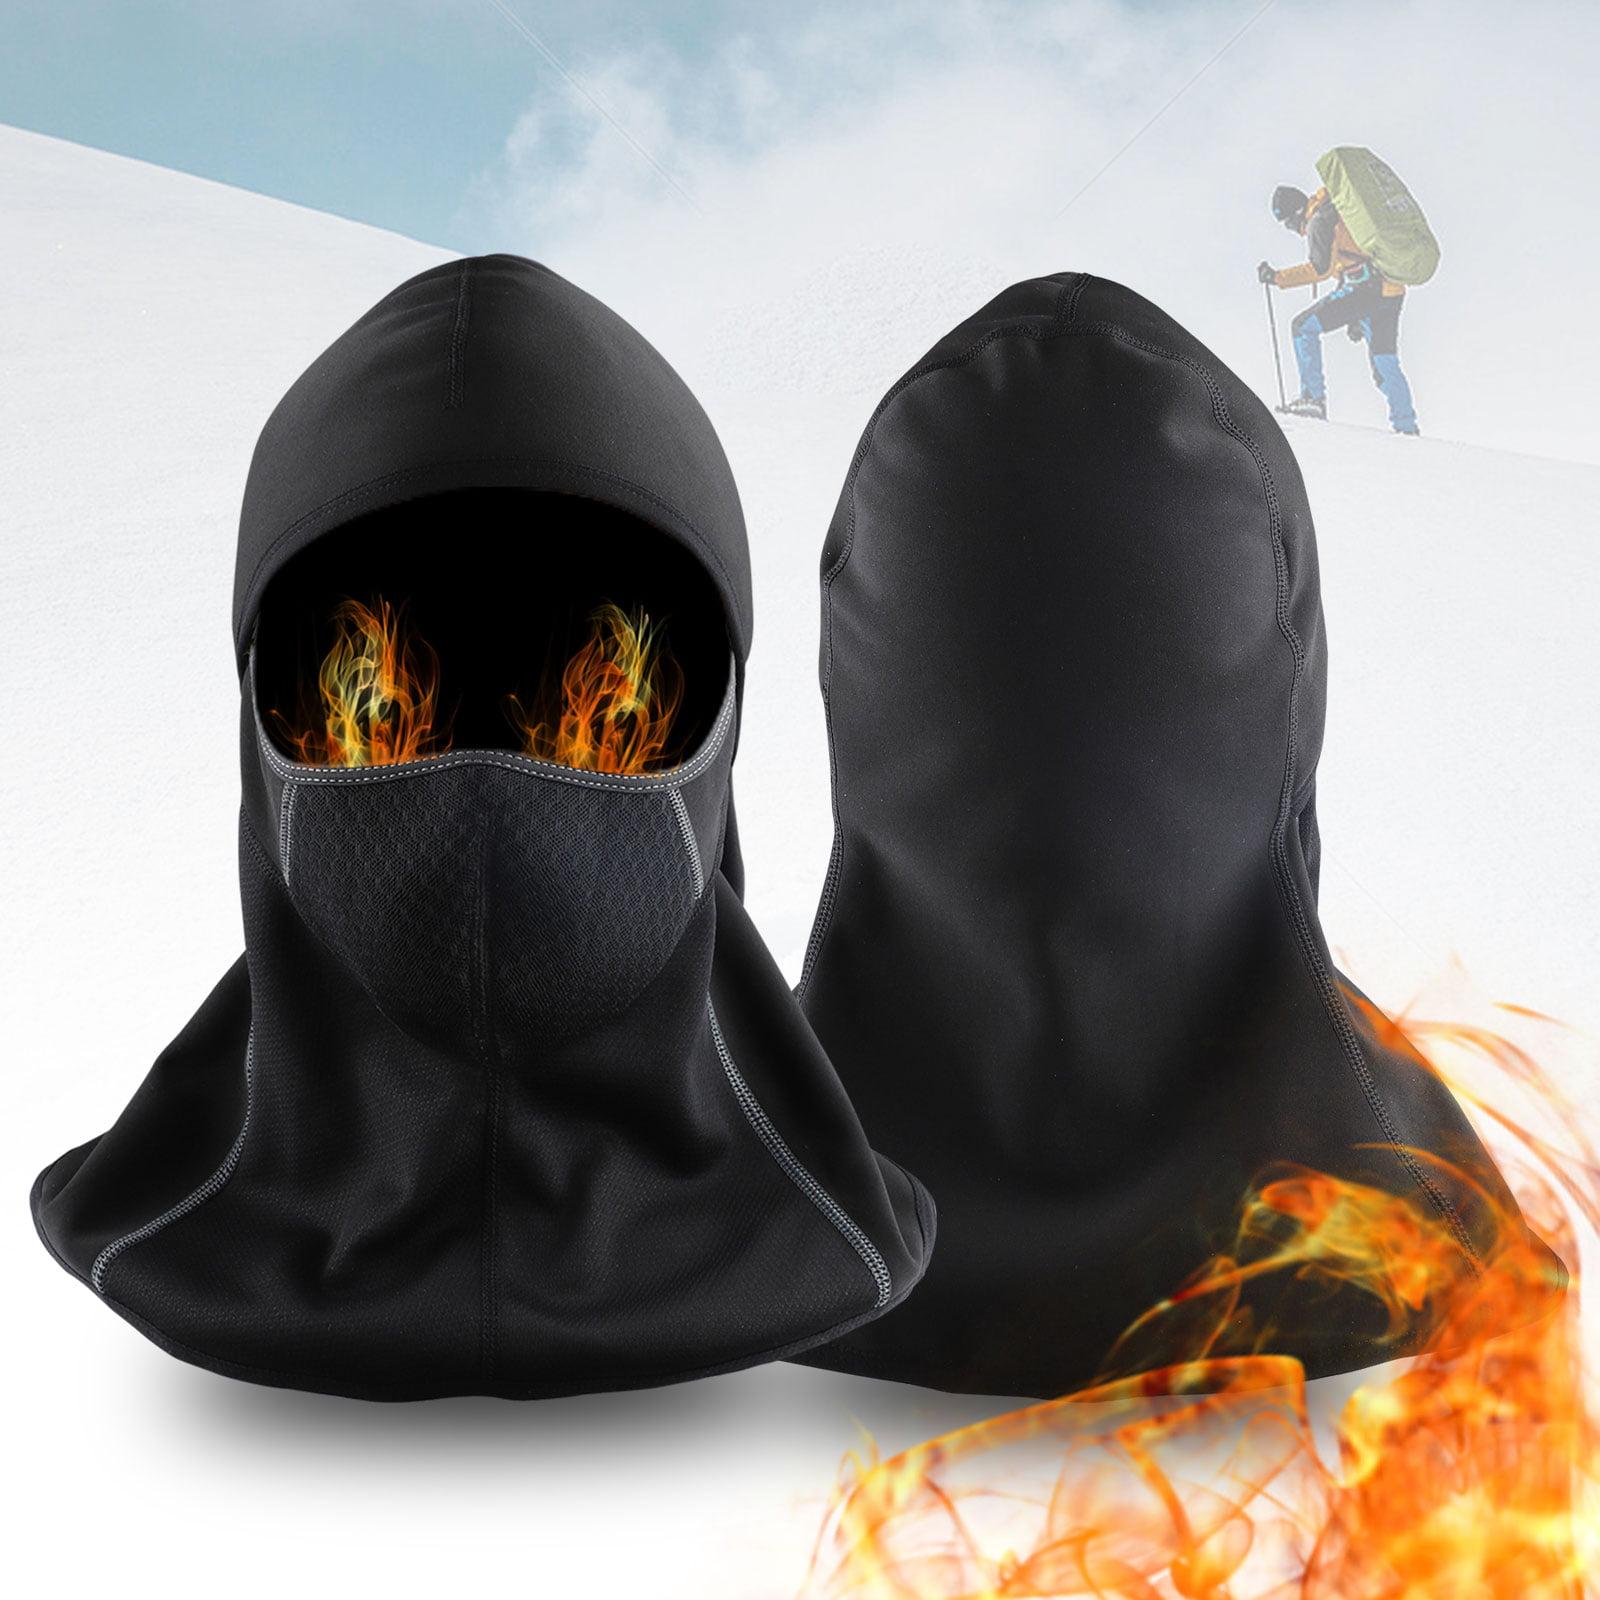 Adult Motorcycle Ski Balaclava Full Face Neck Mask Waterproof Windproof Caps Hat